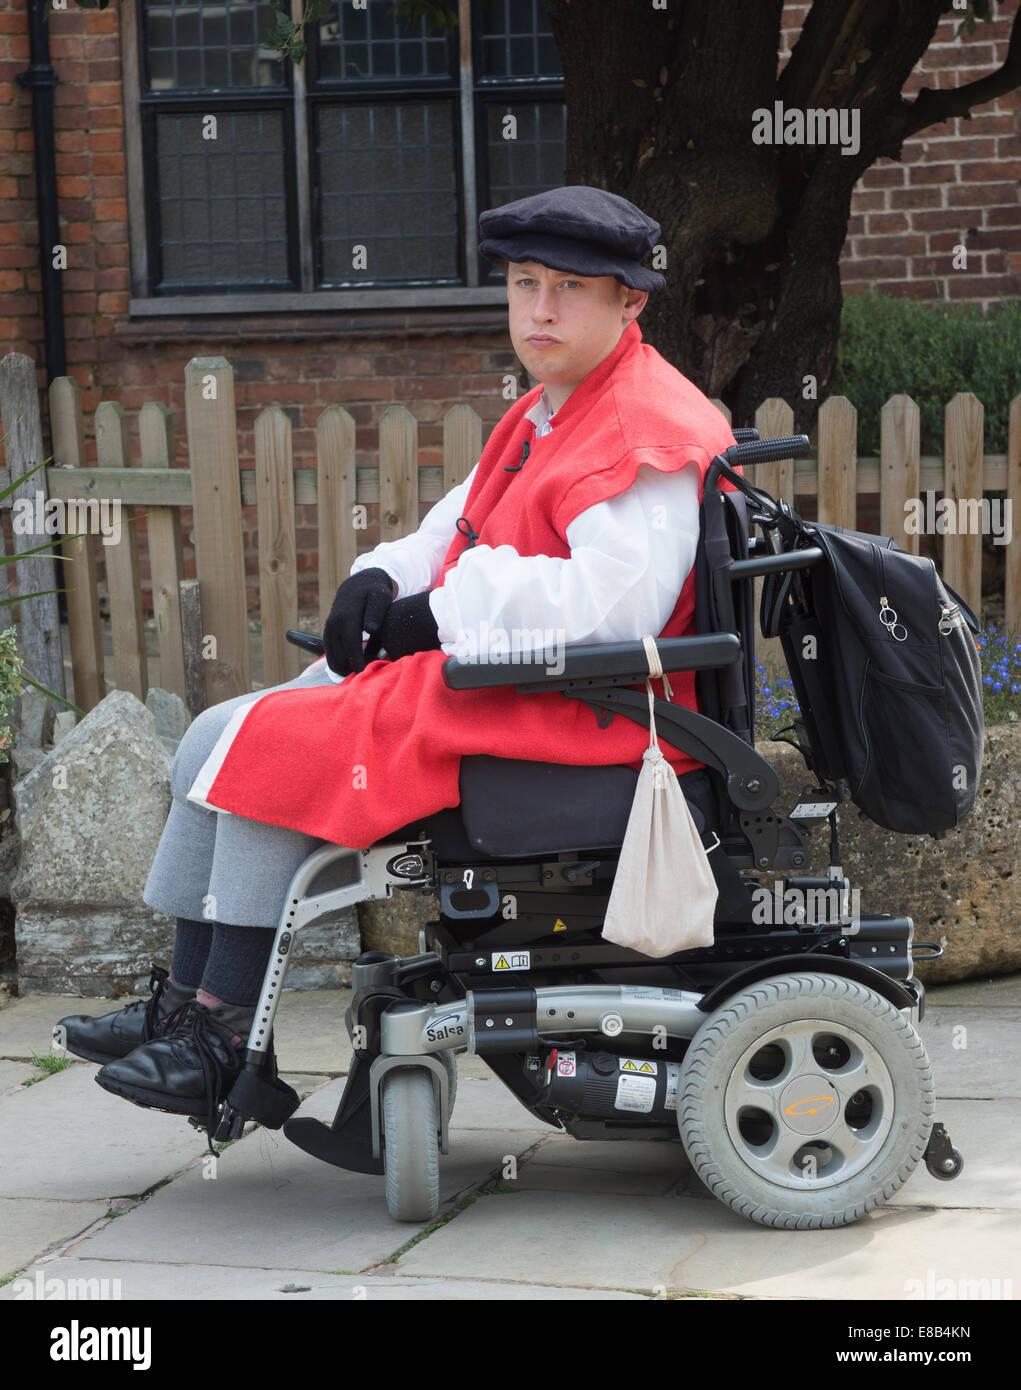 Actor actor de Shakespeare discapacitados en silla de ruedas Imagen De Stock